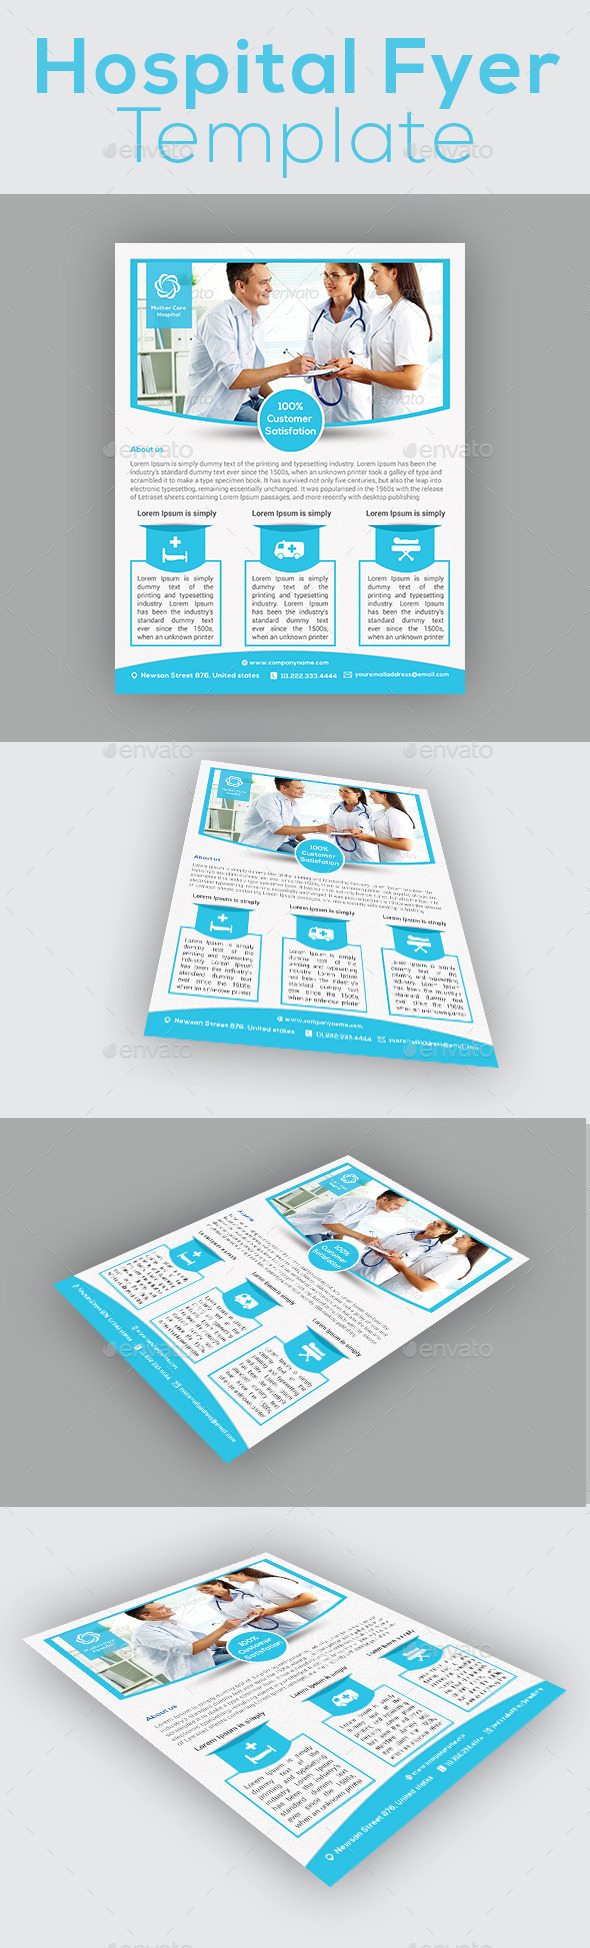 Hospital Flyer Template | Hospital Flyer Template Pinterest Flyer Template Template And